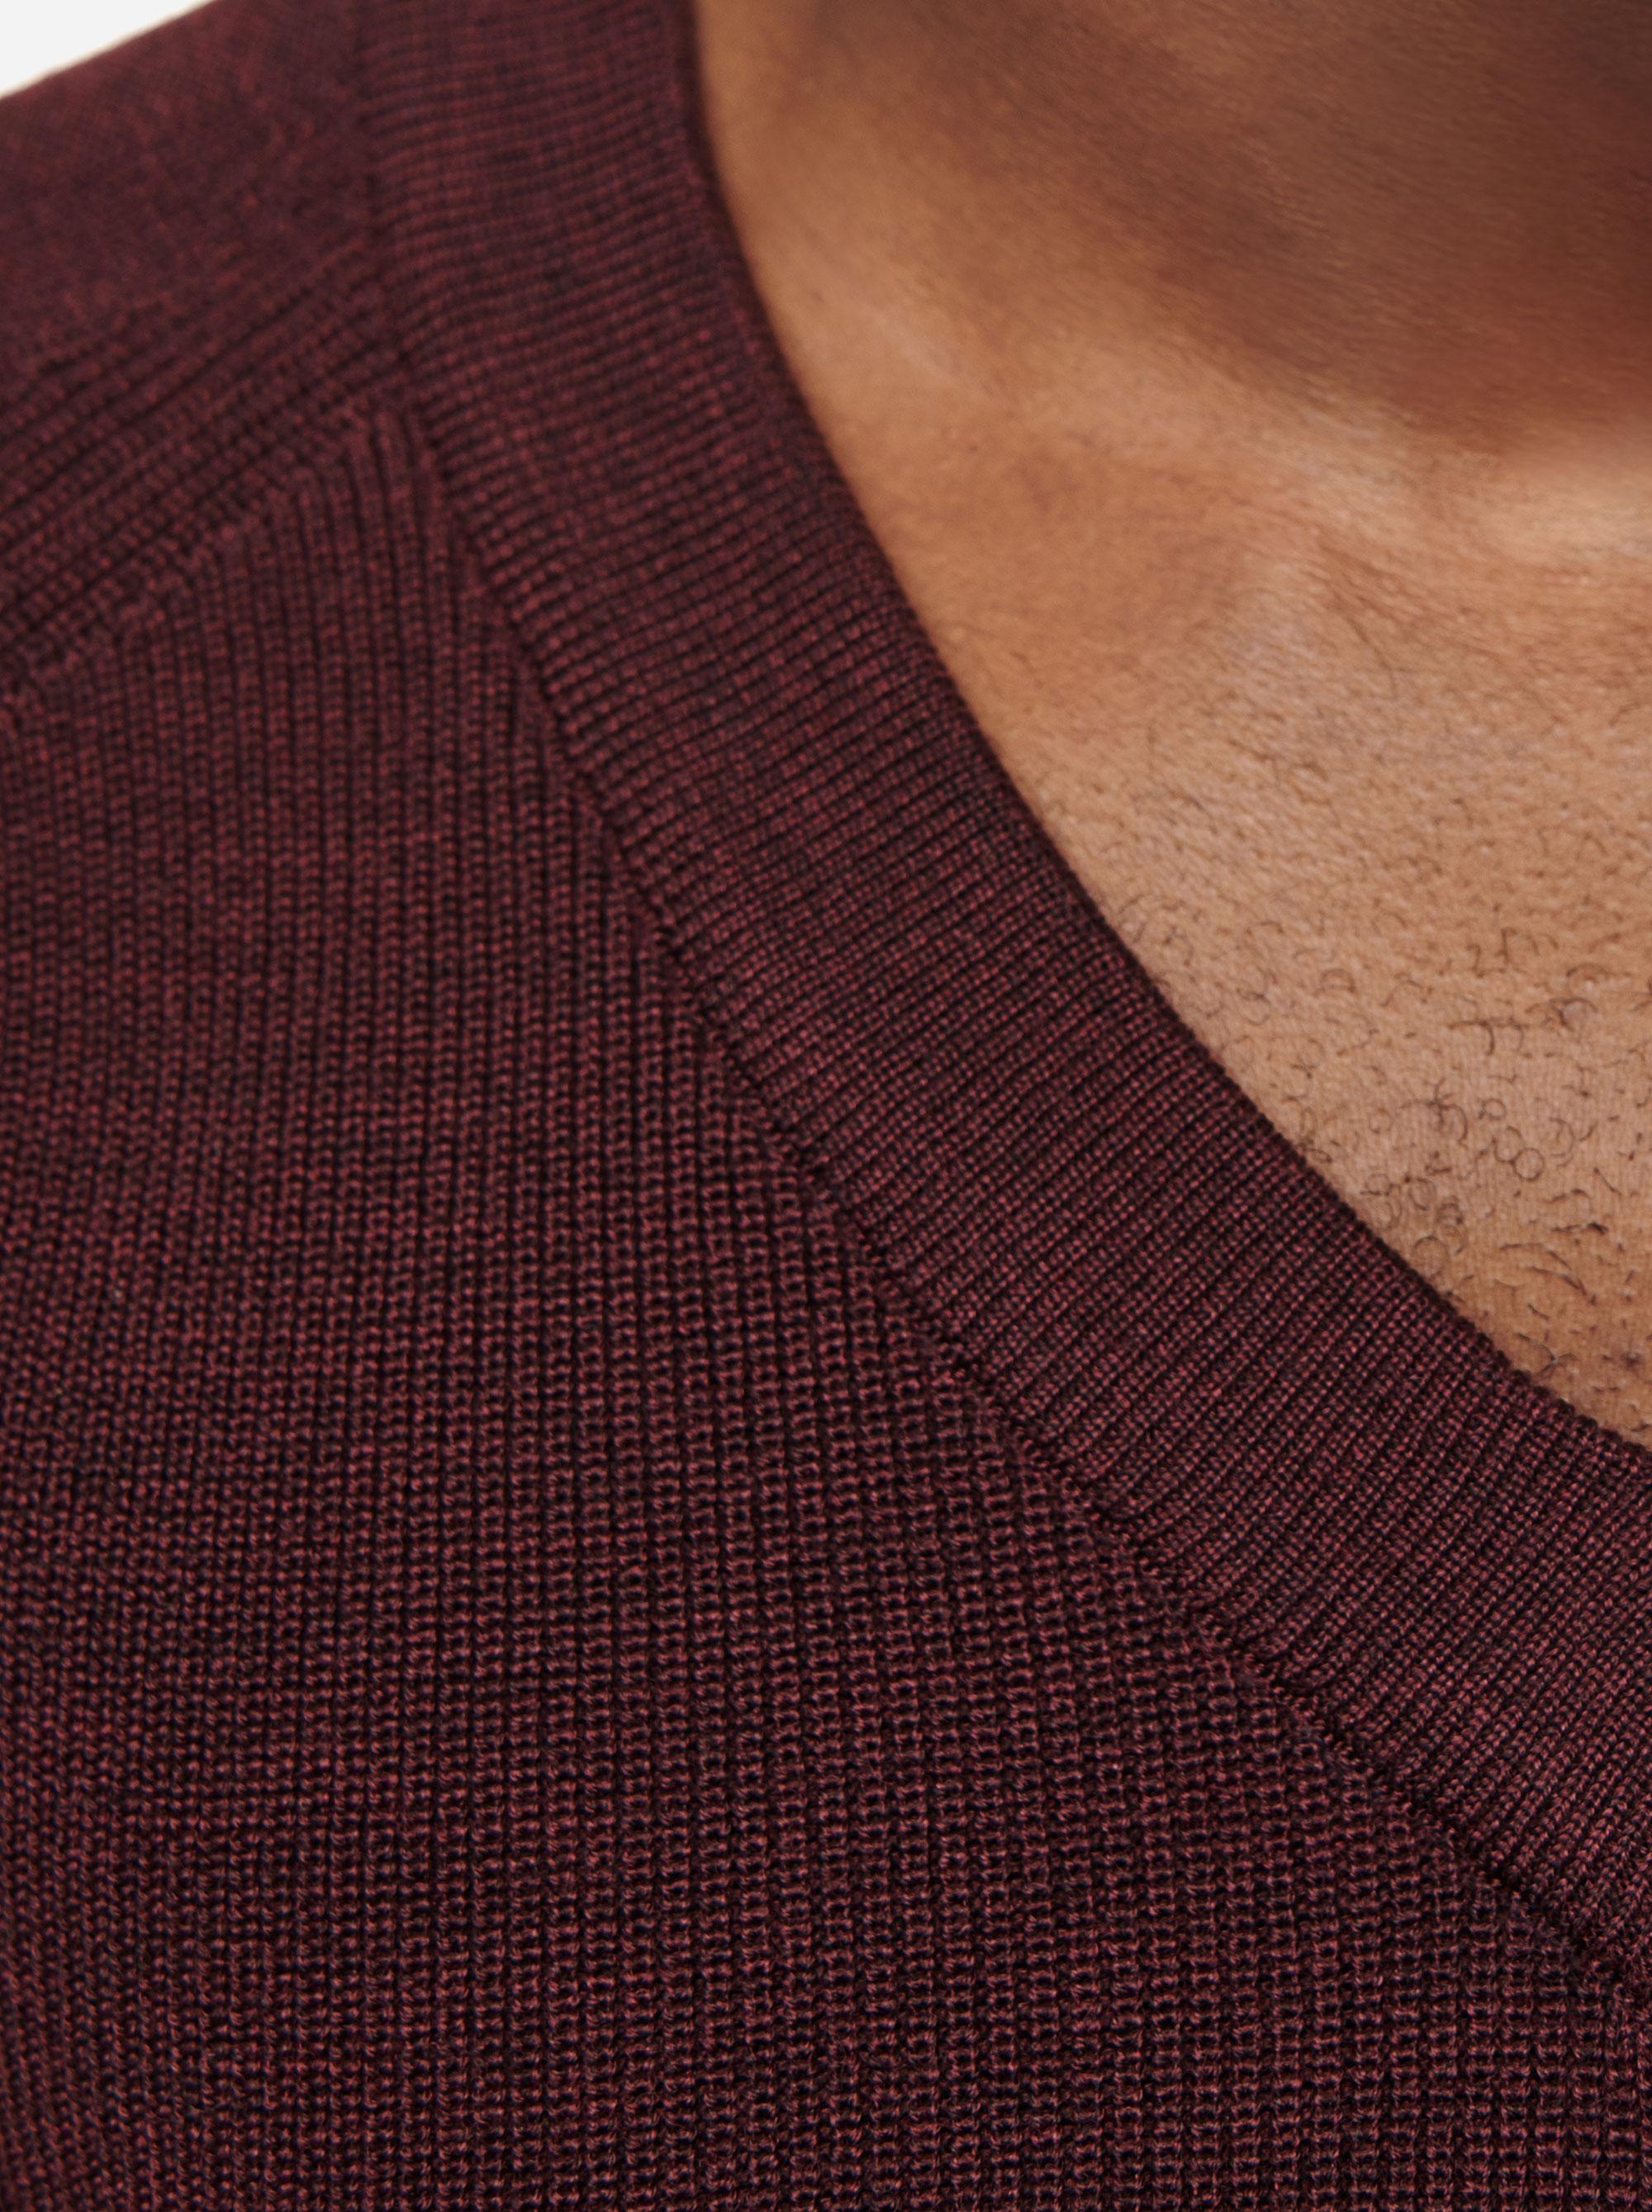 Teym - V-Neck - The Merino Sweater - Men - Burgundy - 2